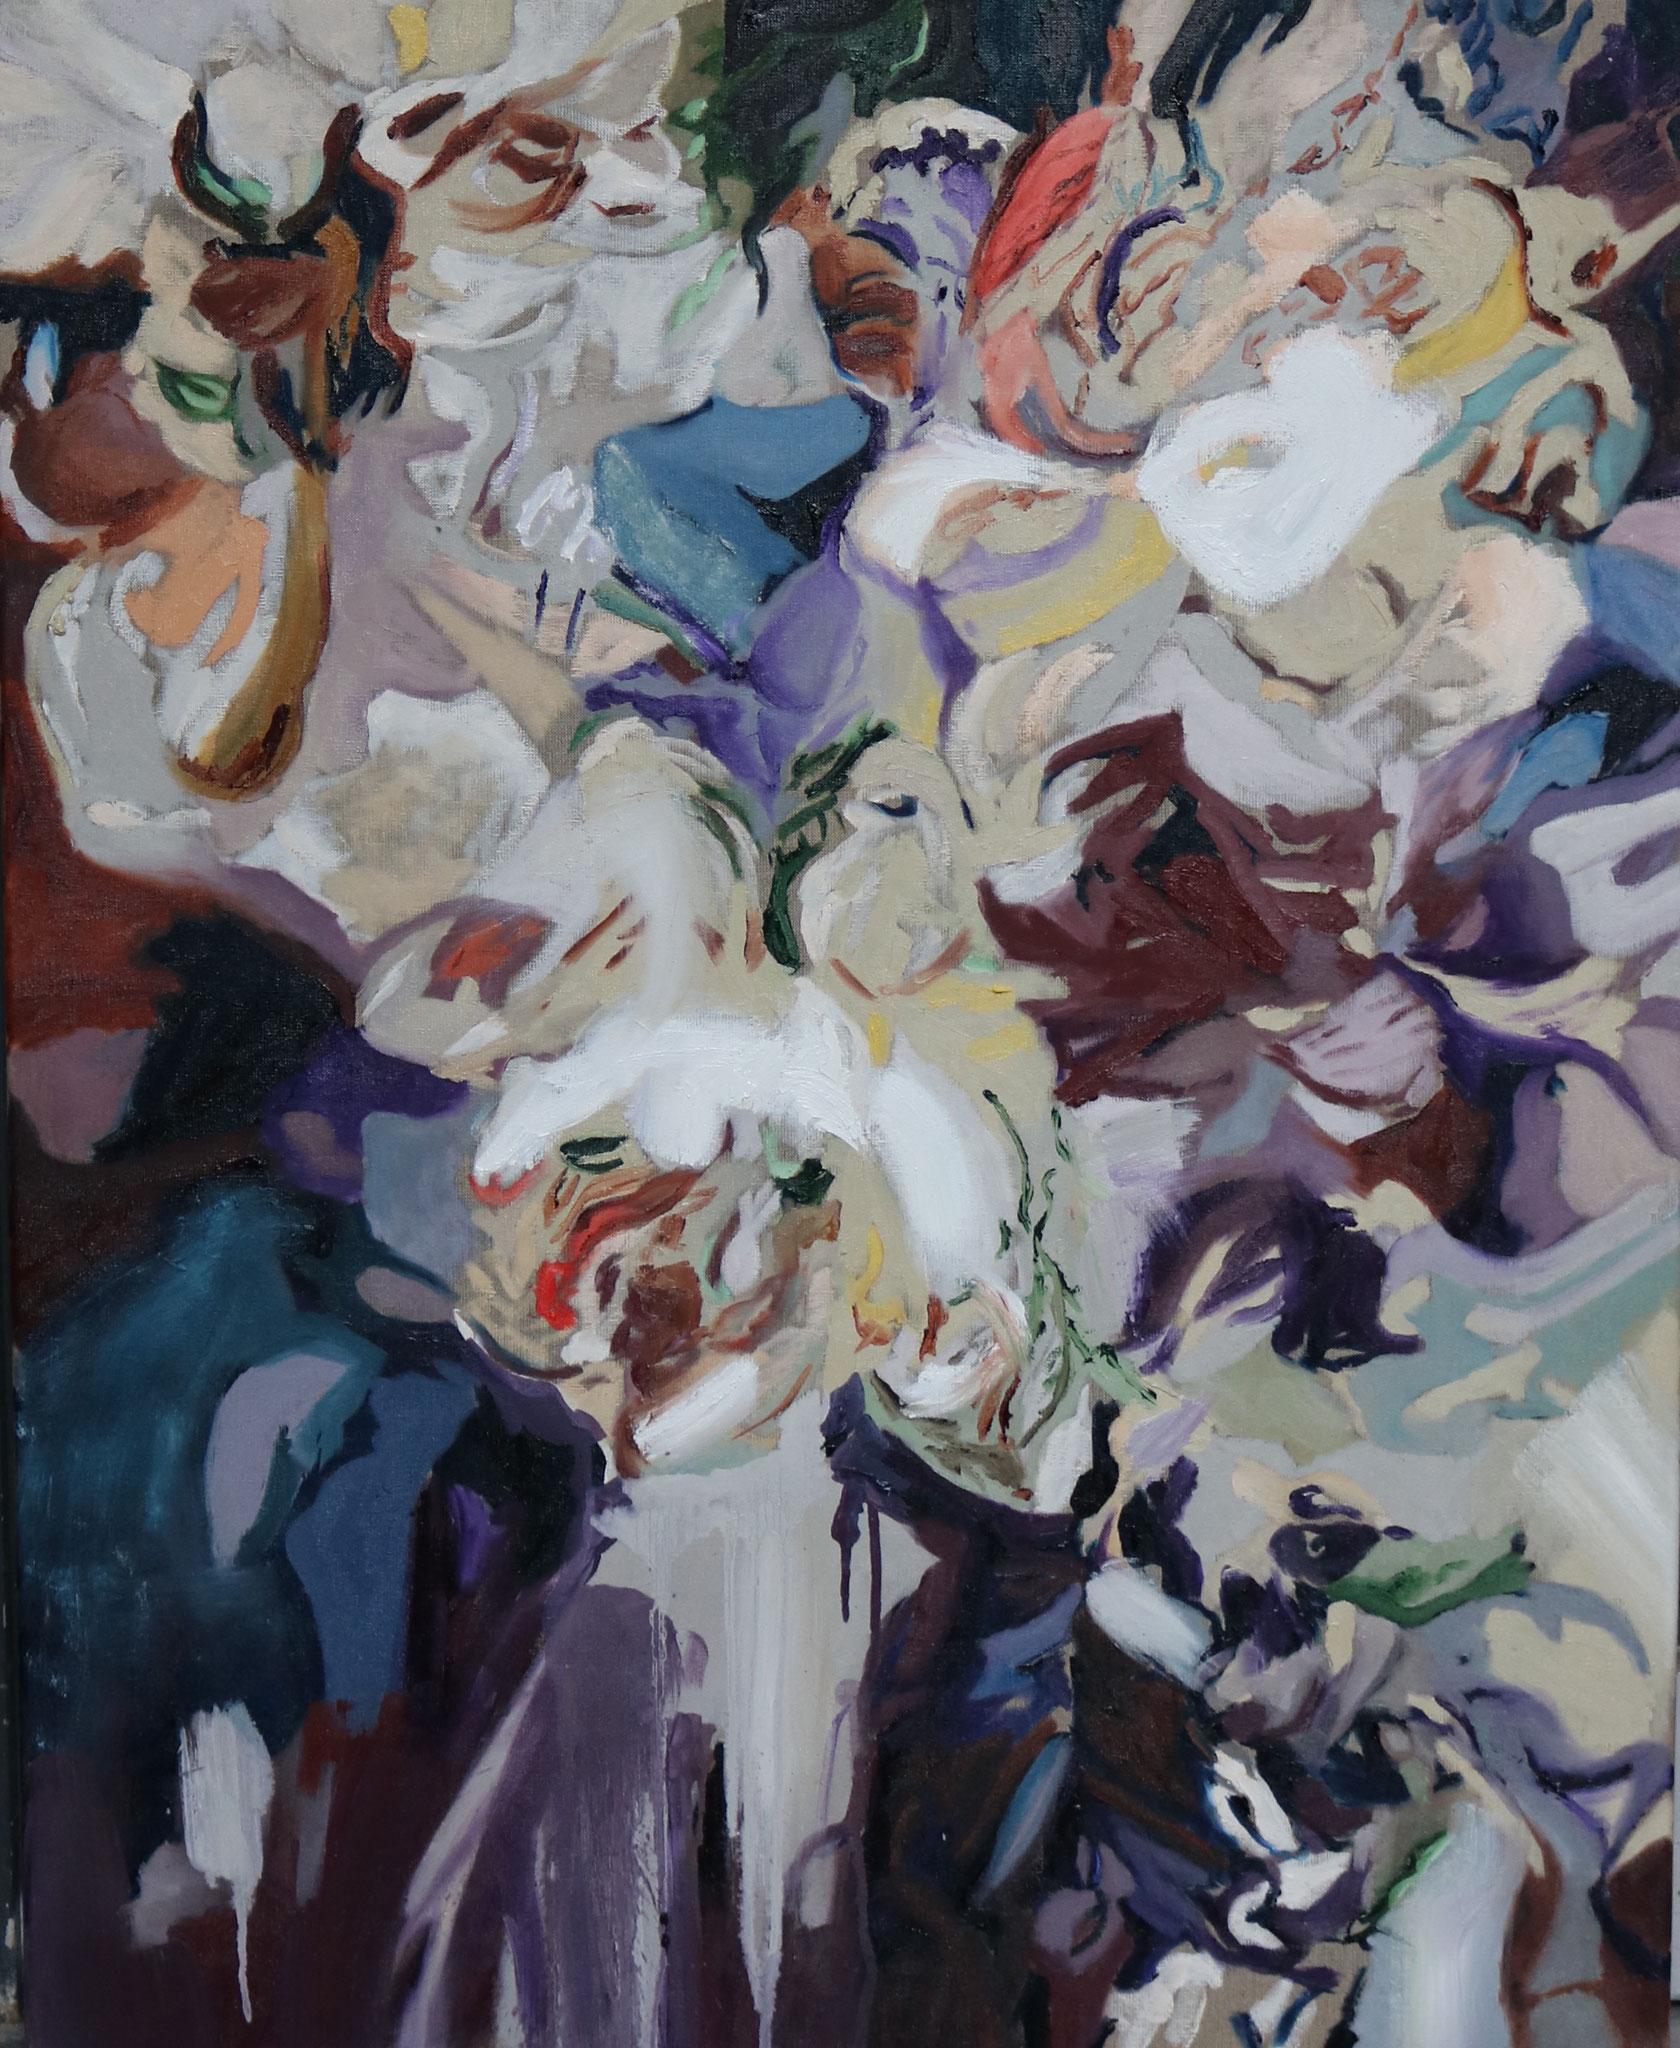 """Blumen II"" 80 x 100 cm - Öl auf Leinwand 2017"